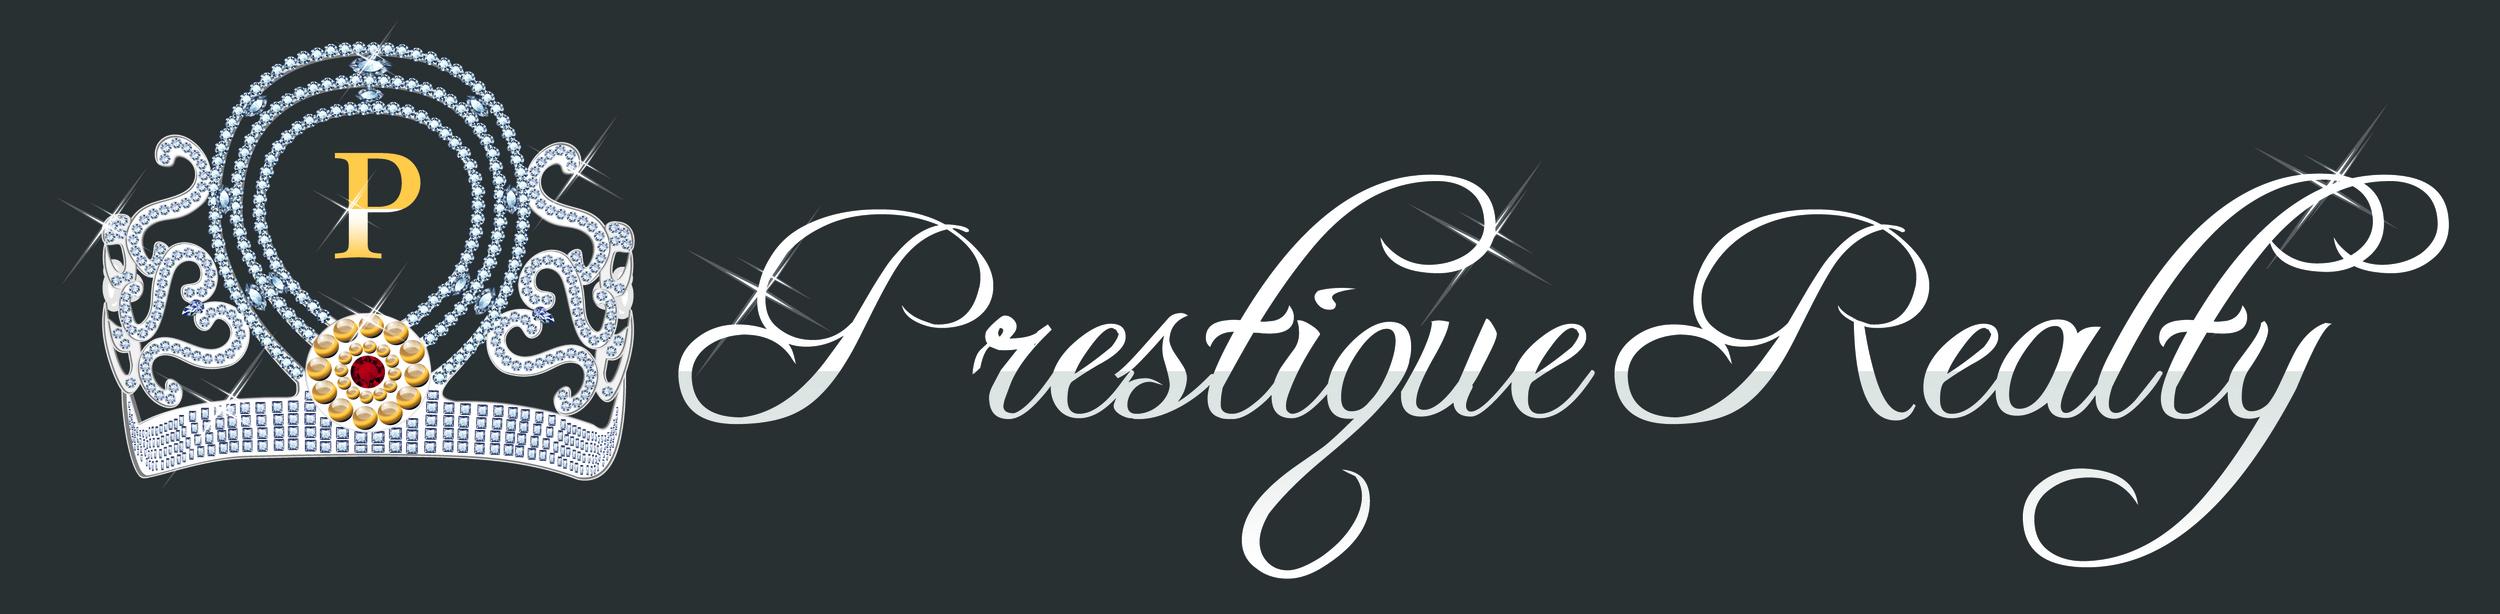 logo-color--print-ready-040816.jpg